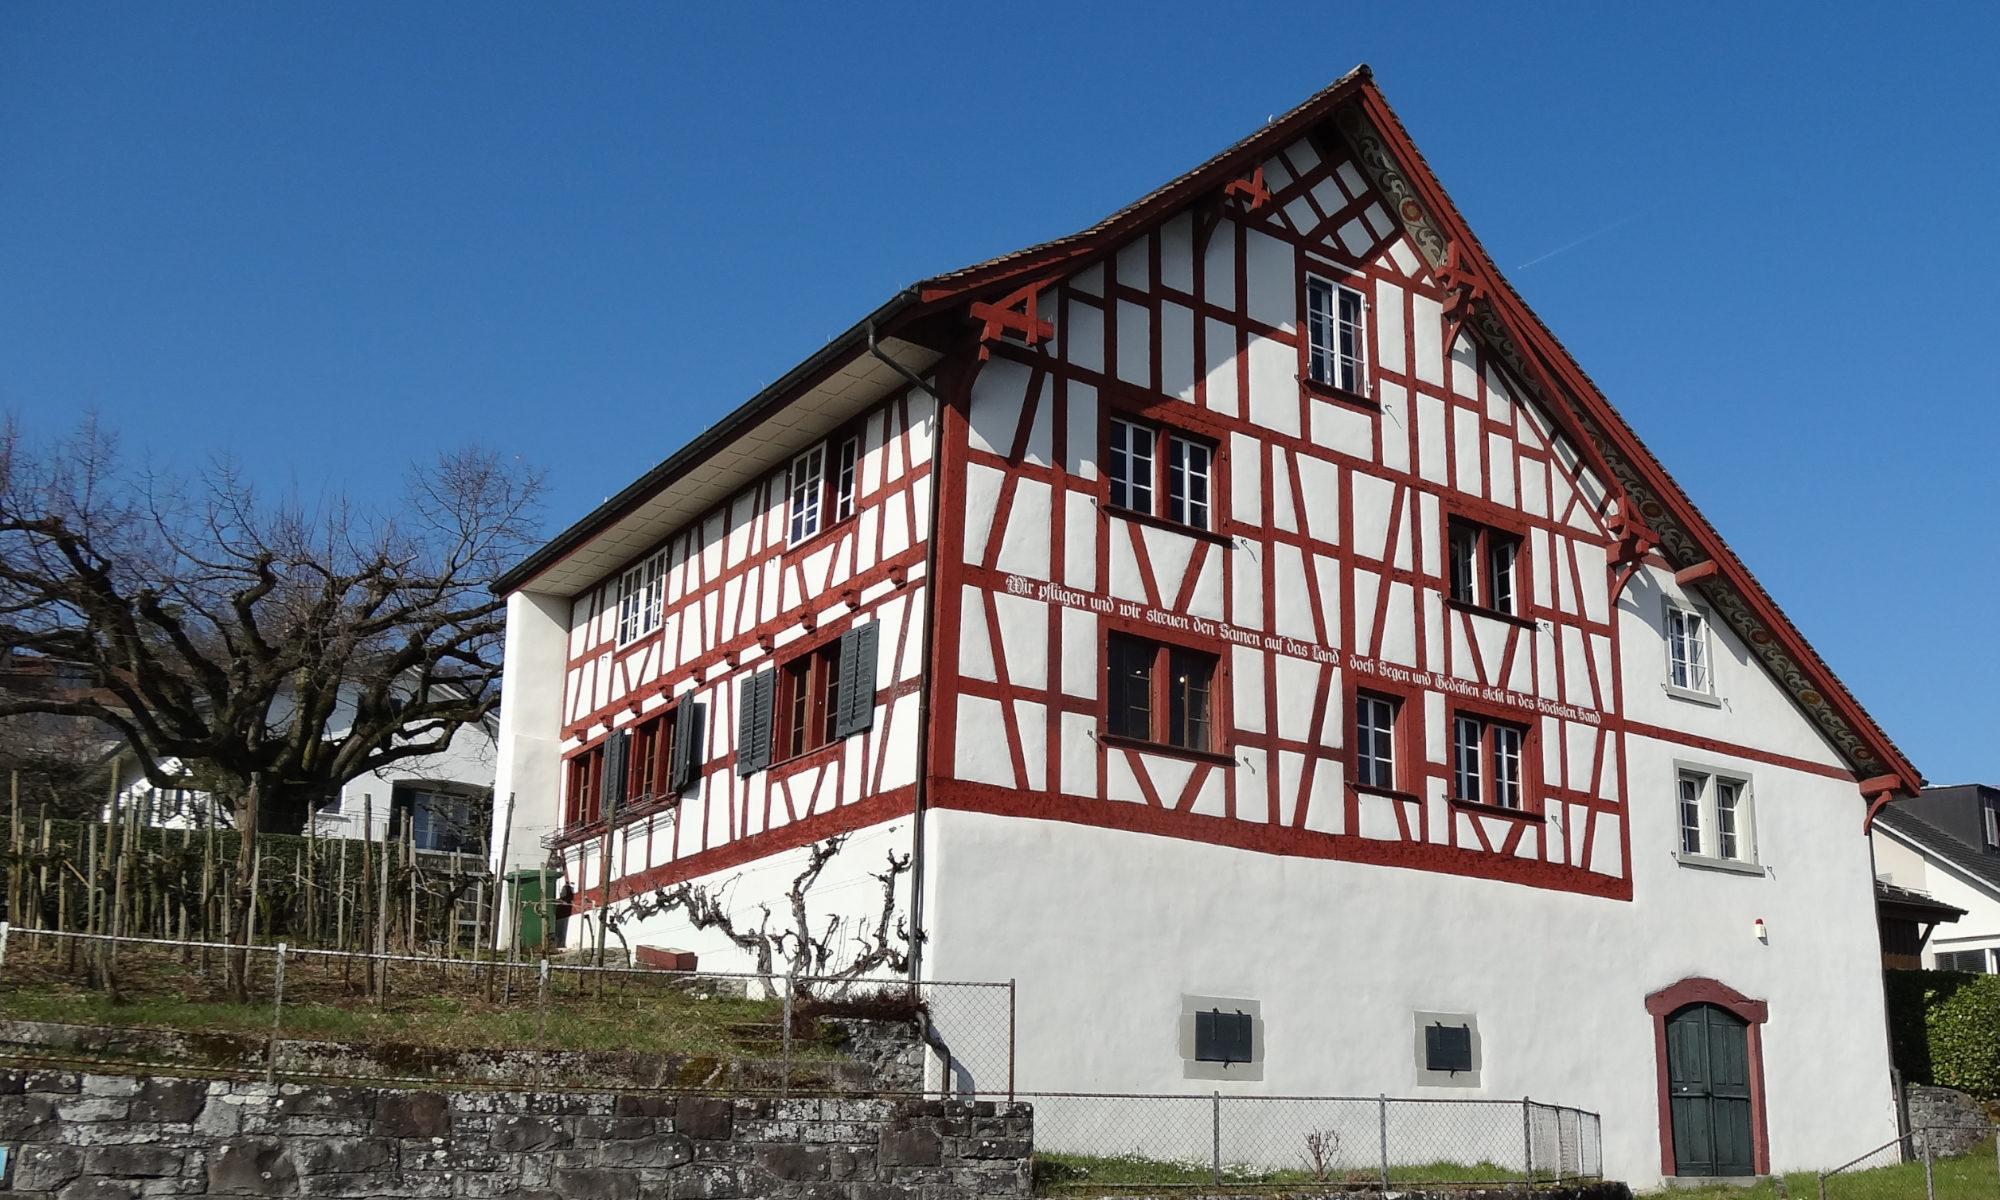 Ortsmuseum Rüschlikon